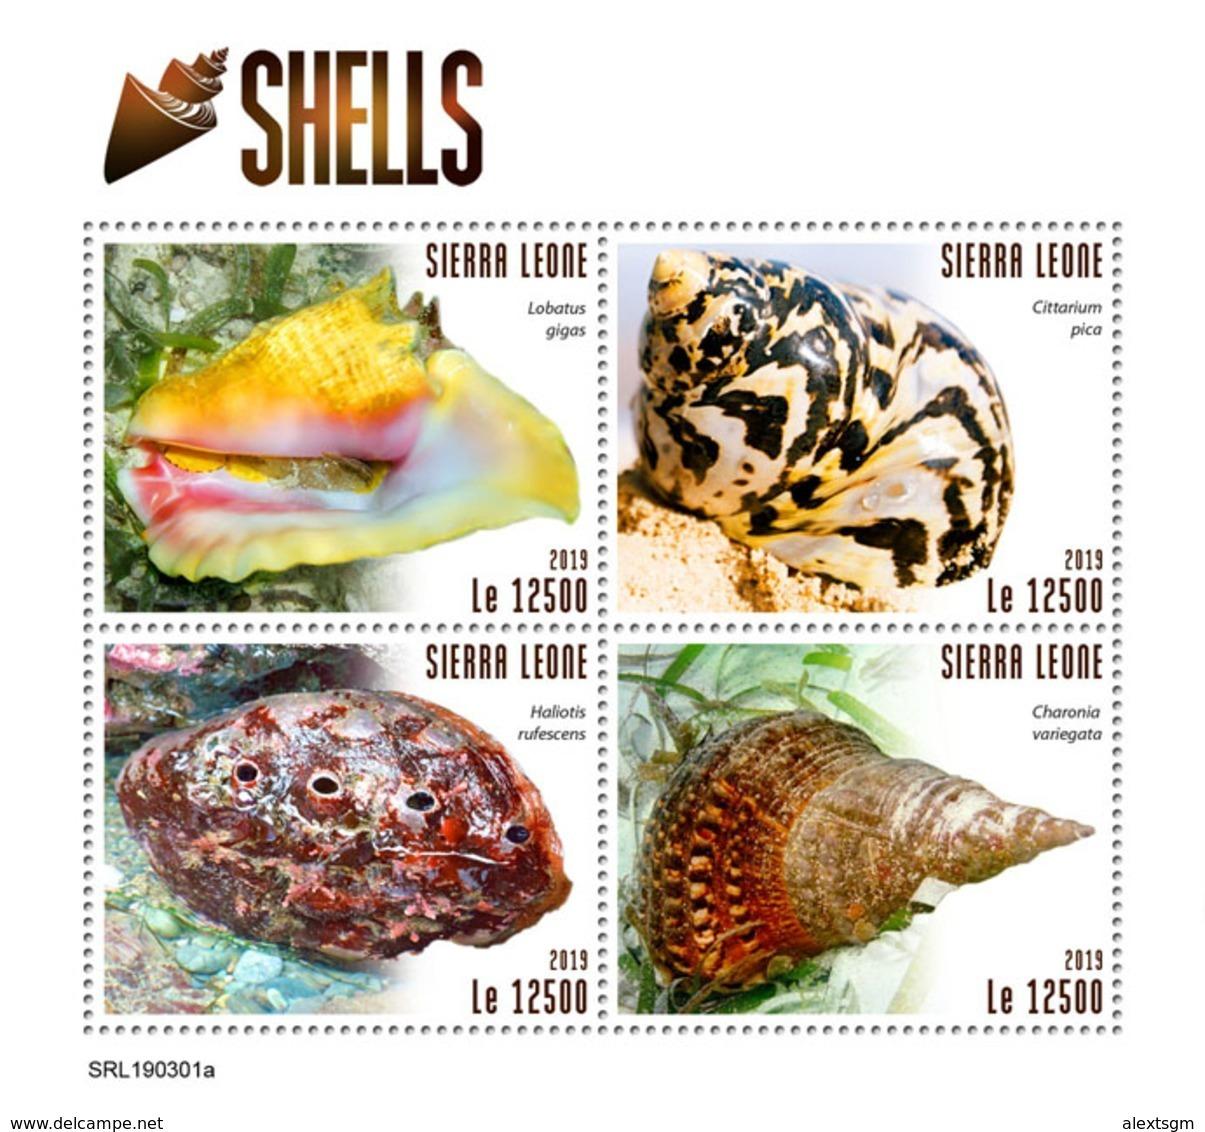 SIERRA LEONE 2019 - Shells. Official Issue. - Schelpen